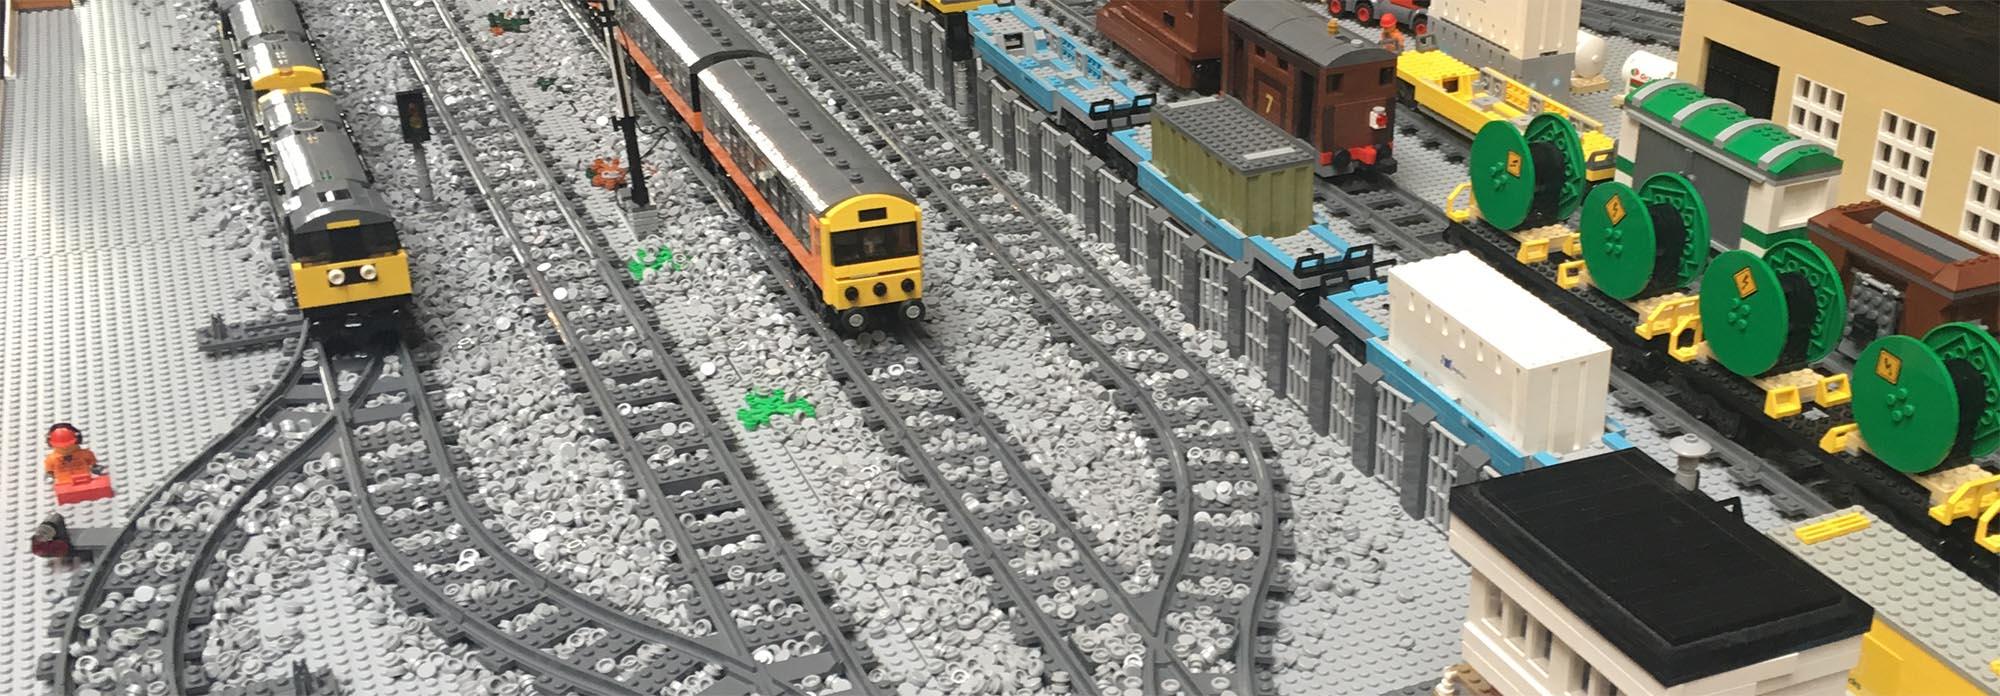 LEGO locomotive models by LNUR members